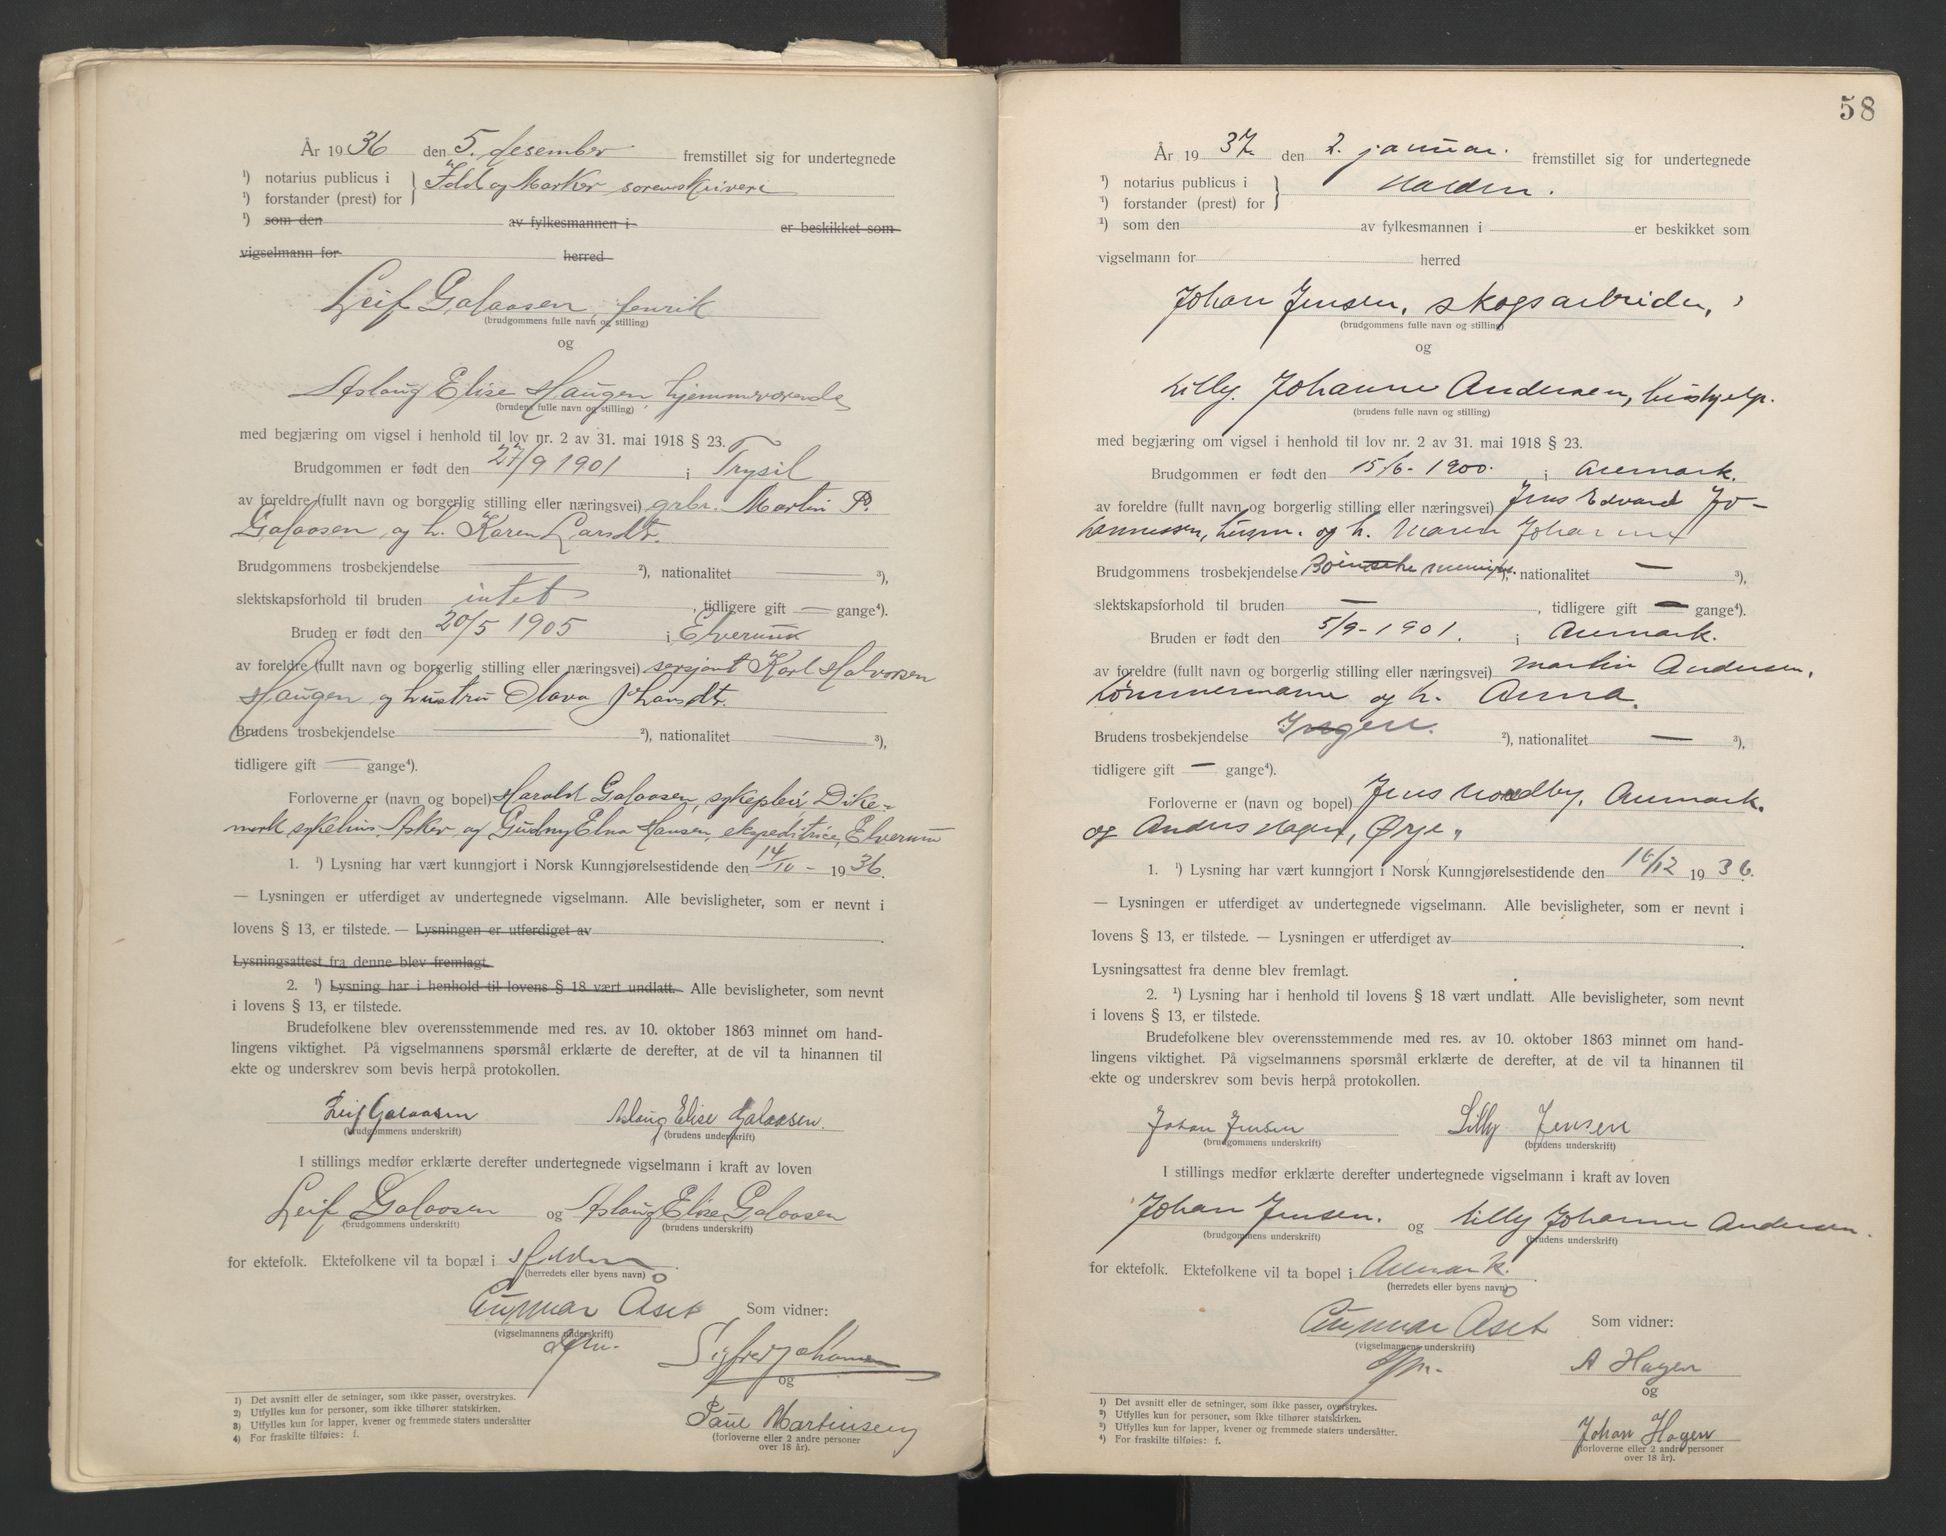 SAO, Idd og Marker sorenskriveri, L/Lc/L0001: Vigselsbøker, 1920-1942, s. 58